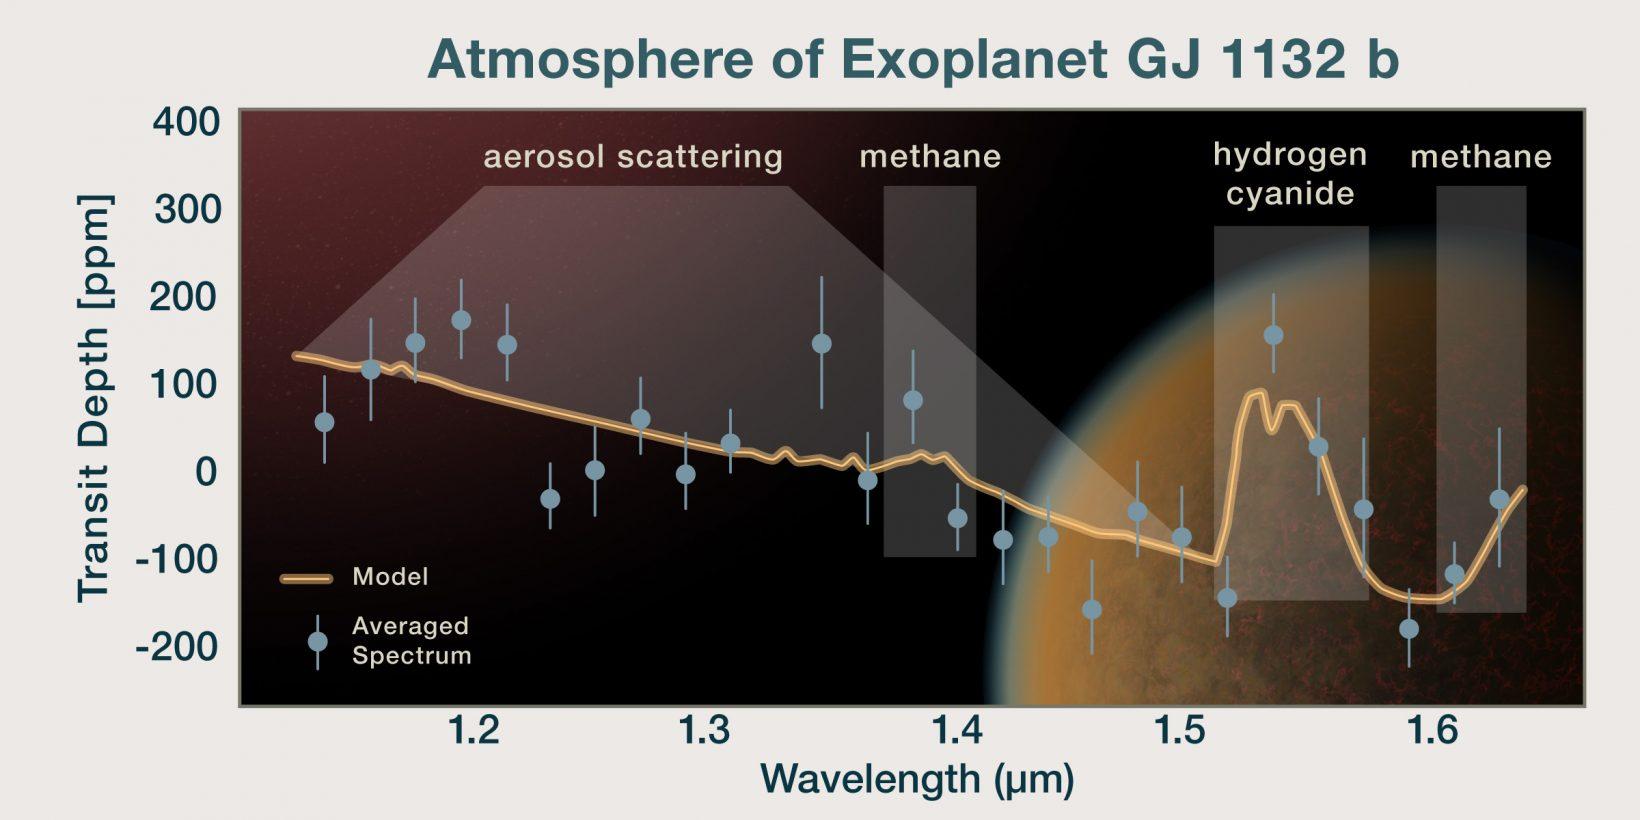 GJ 1132 b atmosphere spectrum